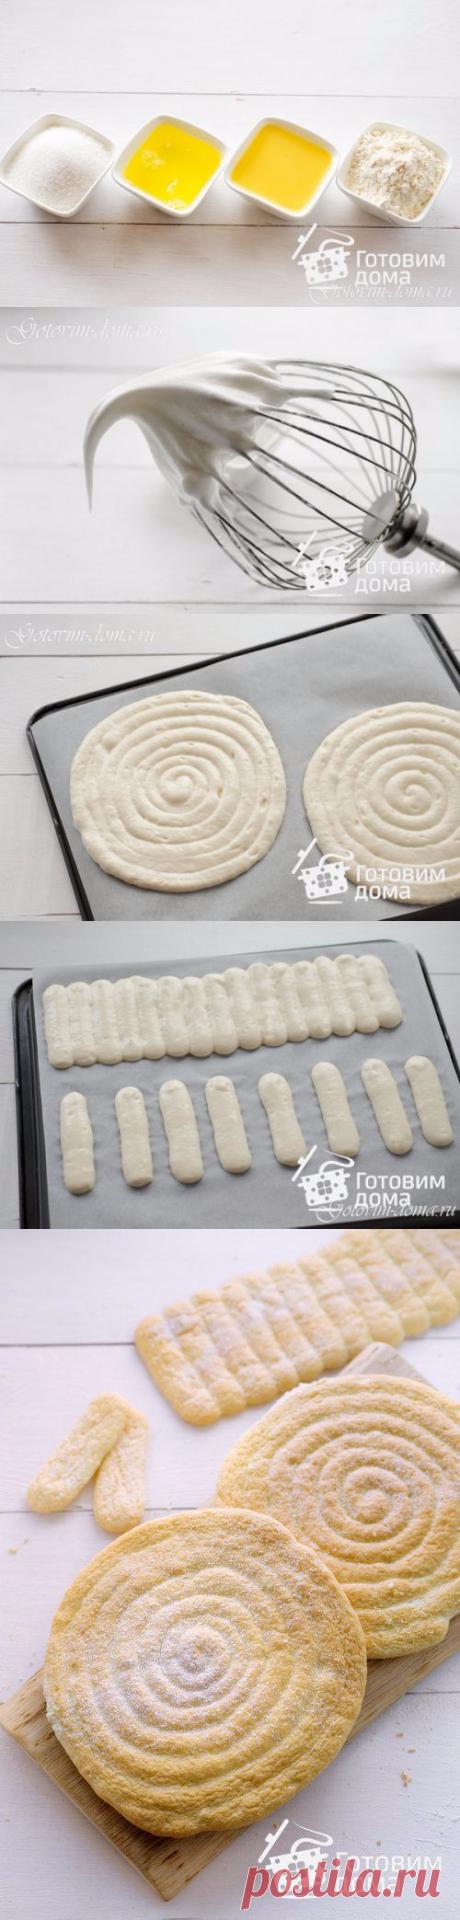 Бисквит Cuillere (или Дамские пальчики) - пошаговый рецепт с фото на Готовим дома